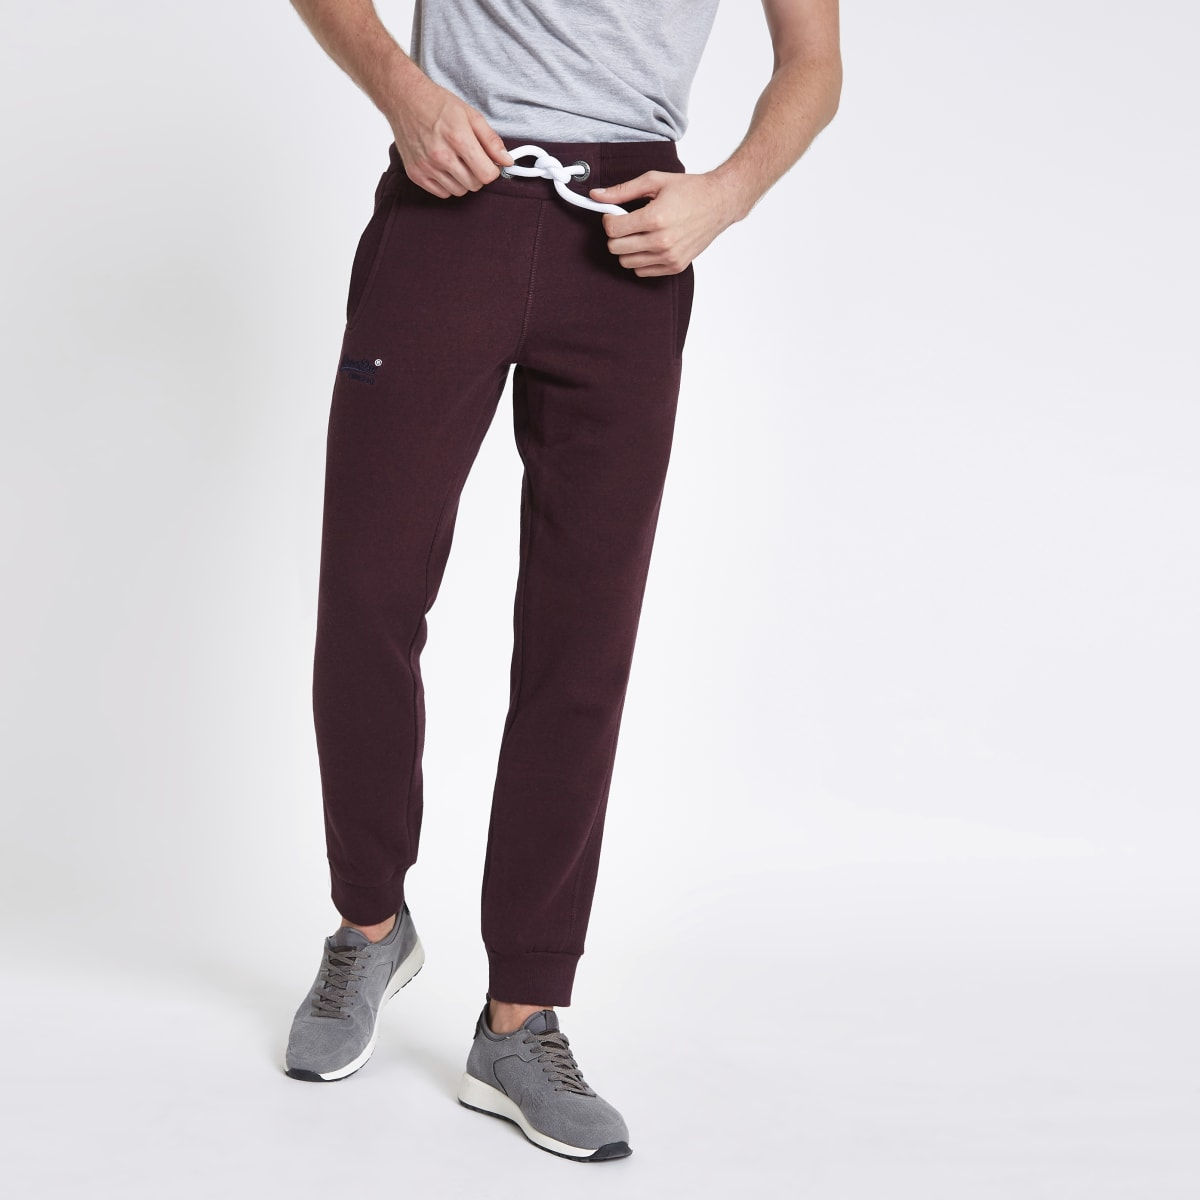 Superdry burgundy cuffed joggers